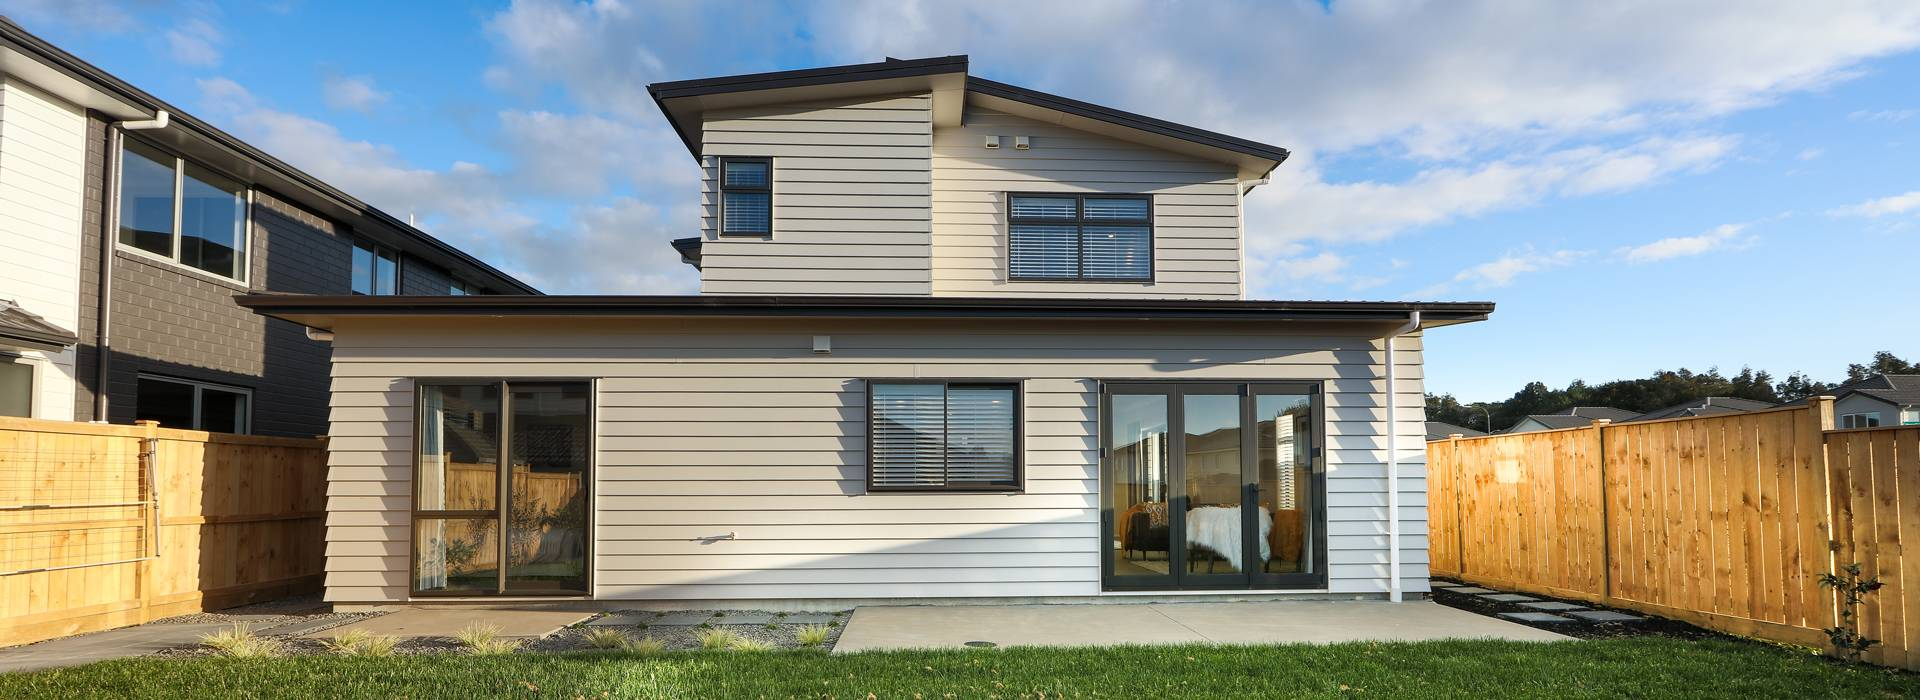 Signature Homes, Show Home - Rowen Estate, Flat Bush